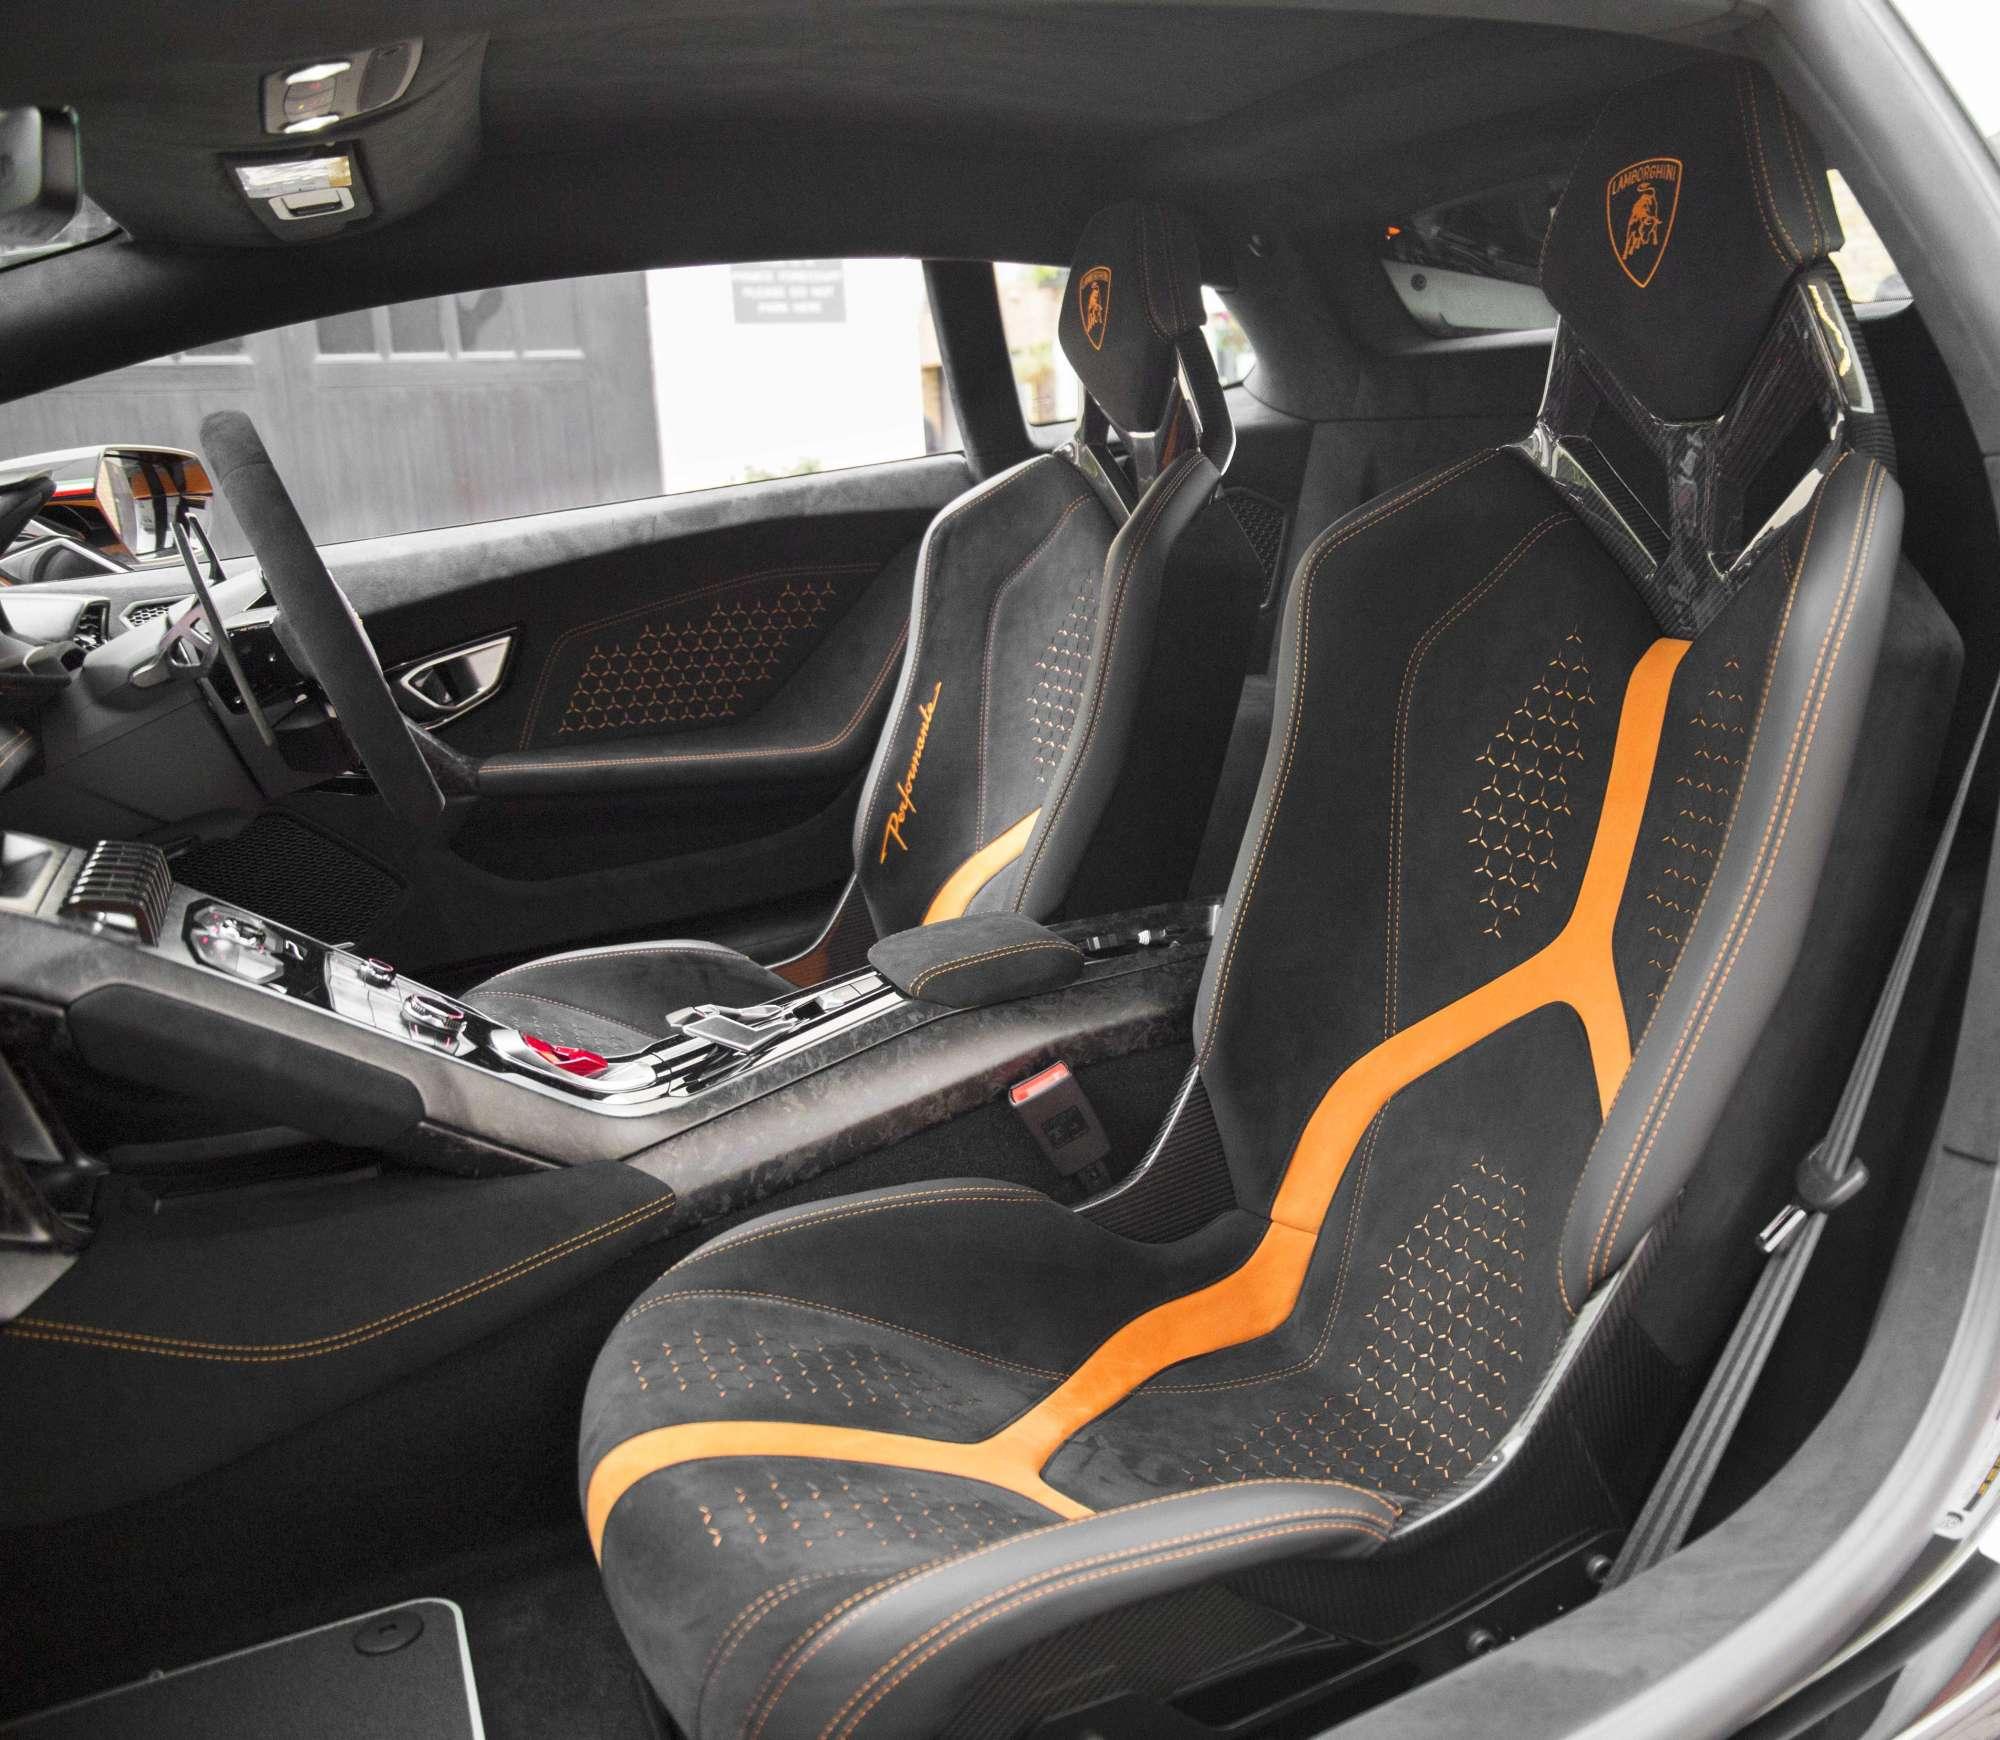 2017 Lamborghini Huracan Interior: Lamborghini Huracan Performante